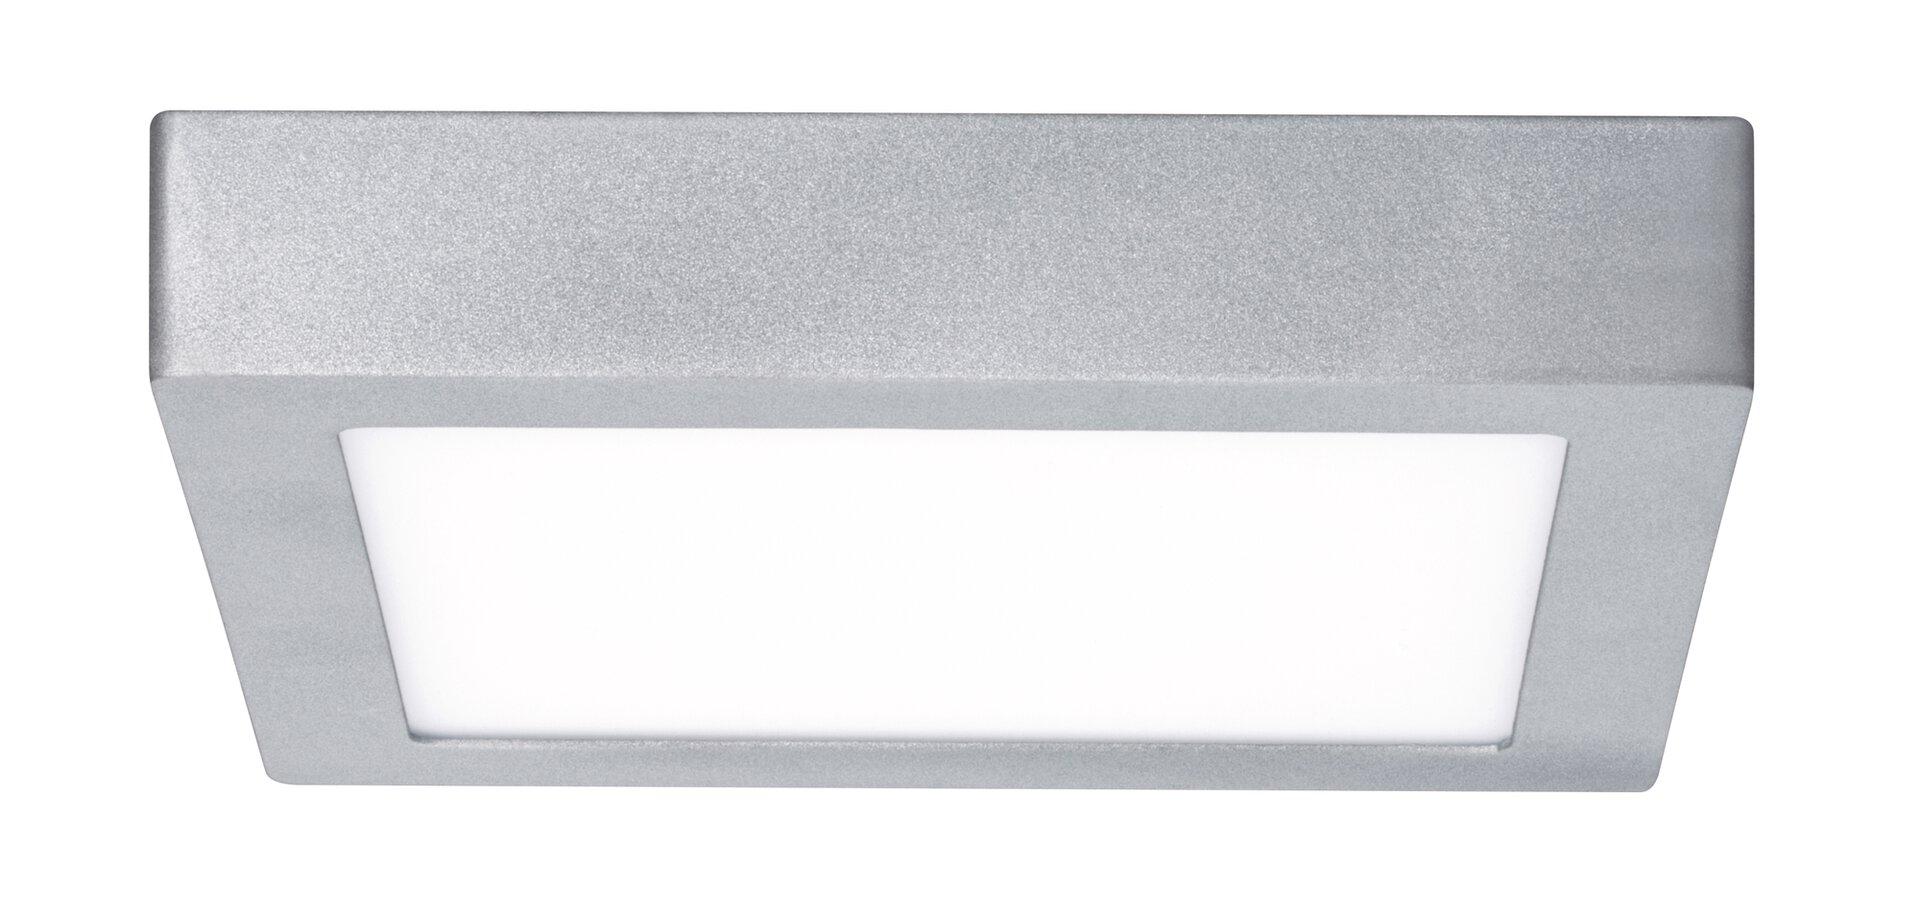 Deckenleuchte LUNAR Paulmann Metall 23 x 4 x 23 cm